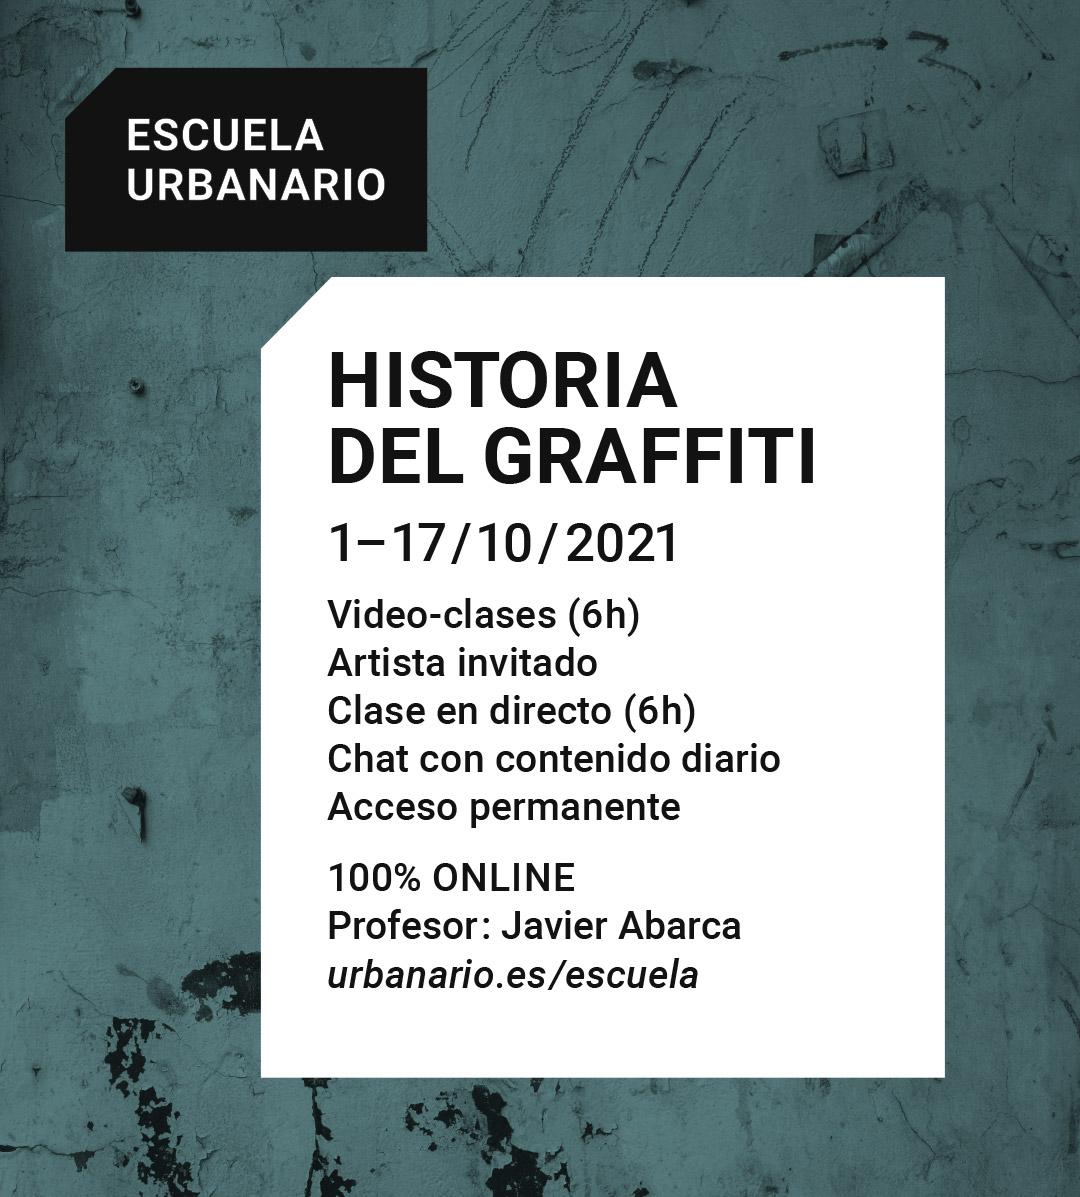 Histora del graffiti - Escuela Urbanario